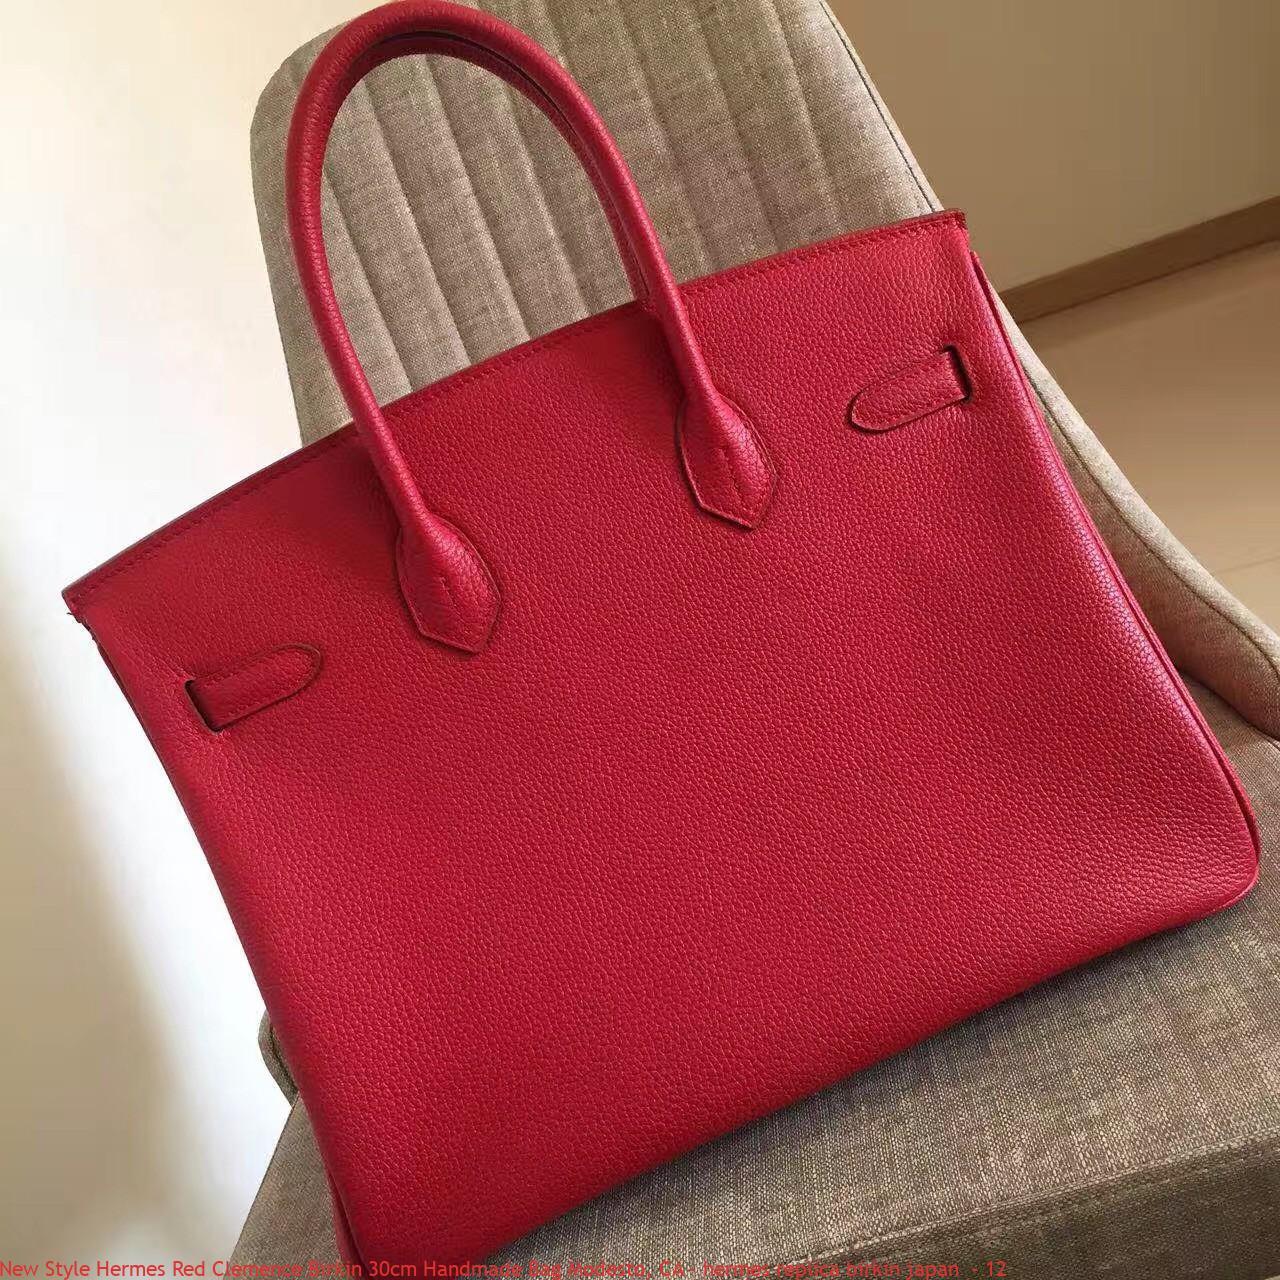 New Style Hermes Red Clemence Birkin 30cm Handmade Bag Modesto d447843af897